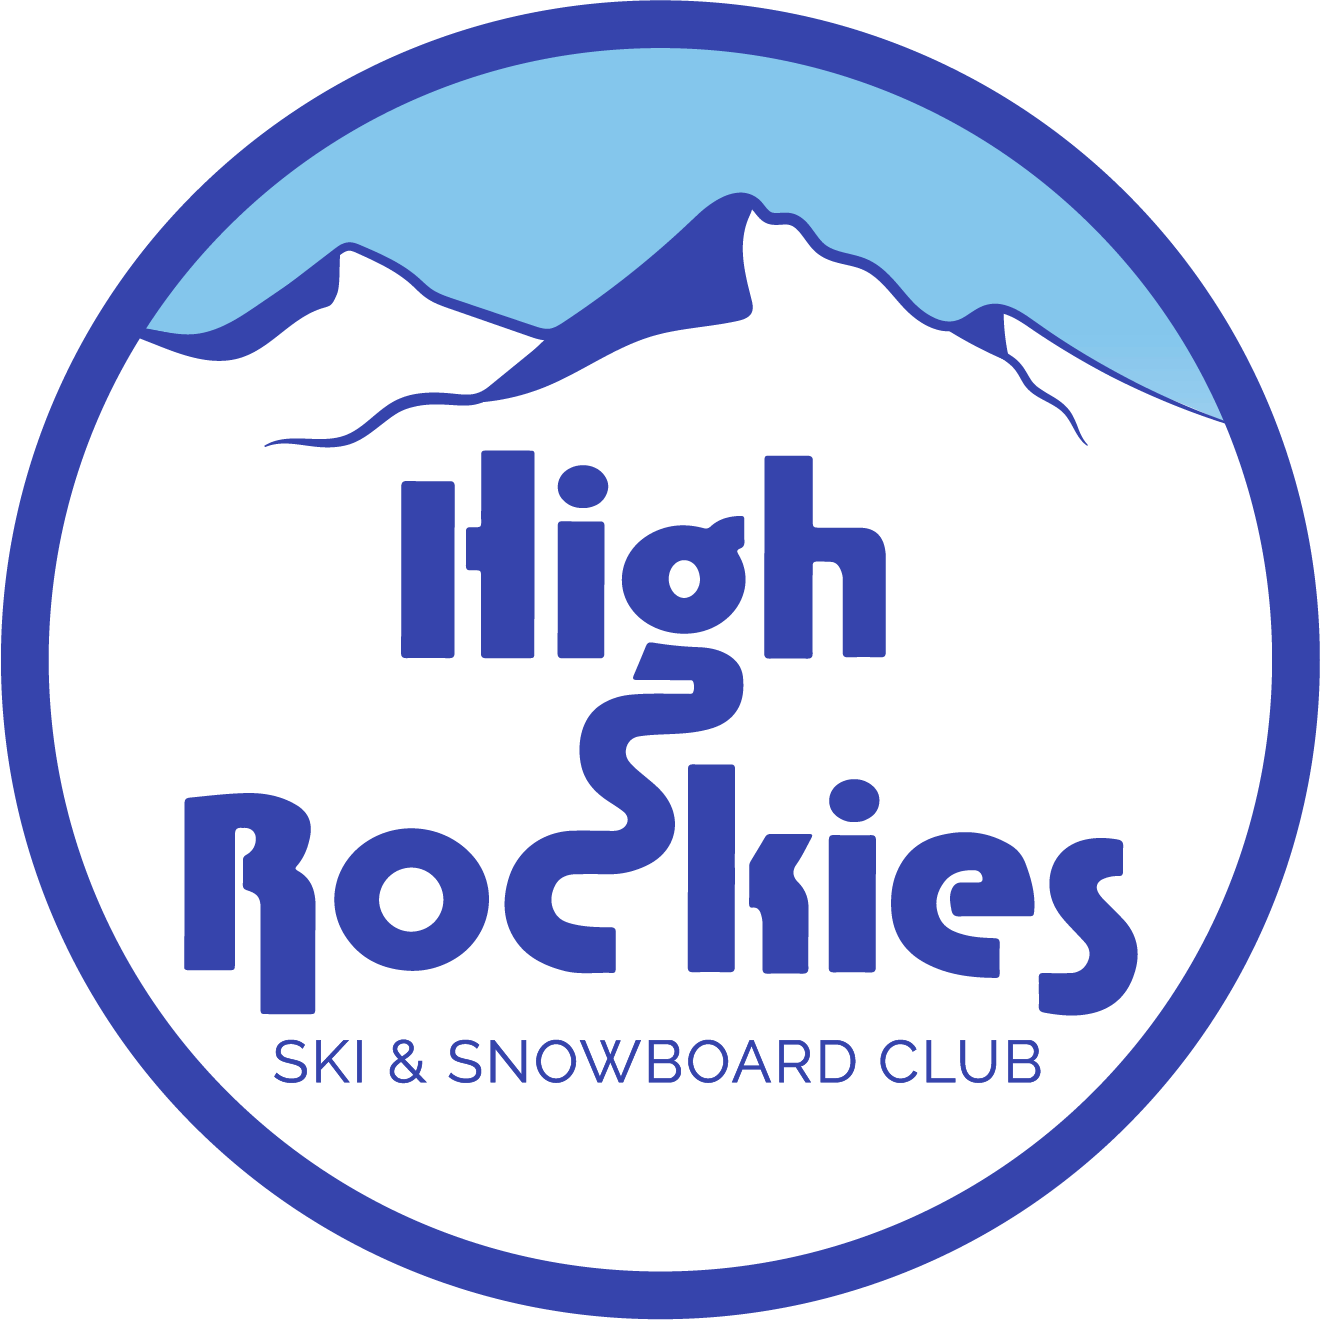 High Rockies Skies and Snowboard Club logo